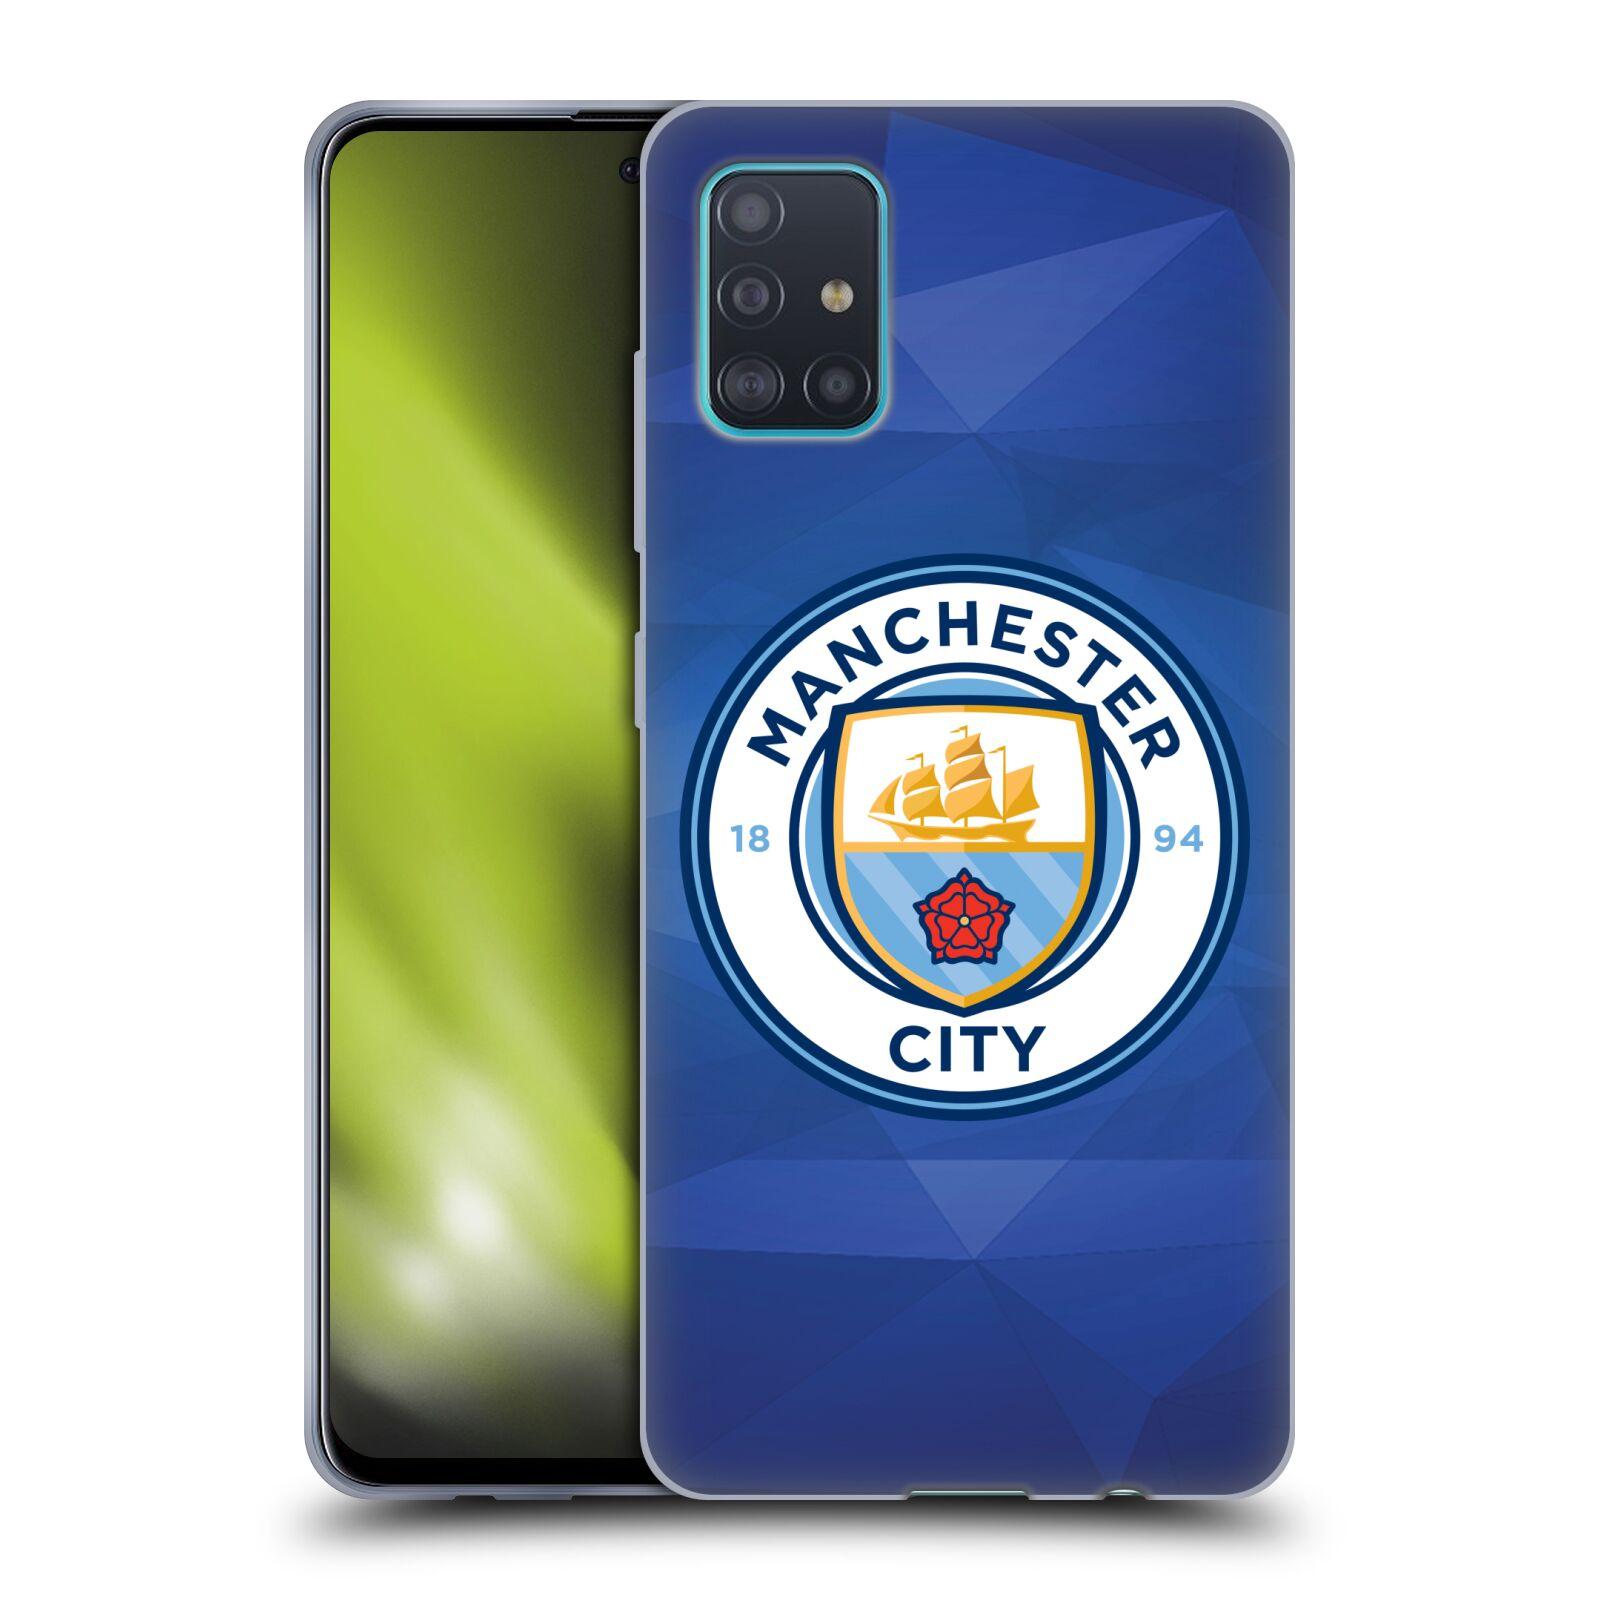 Silikonové pouzdro na mobil Samsung Galaxy A51 - Head Case - Manchester City FC - Modré nové logo